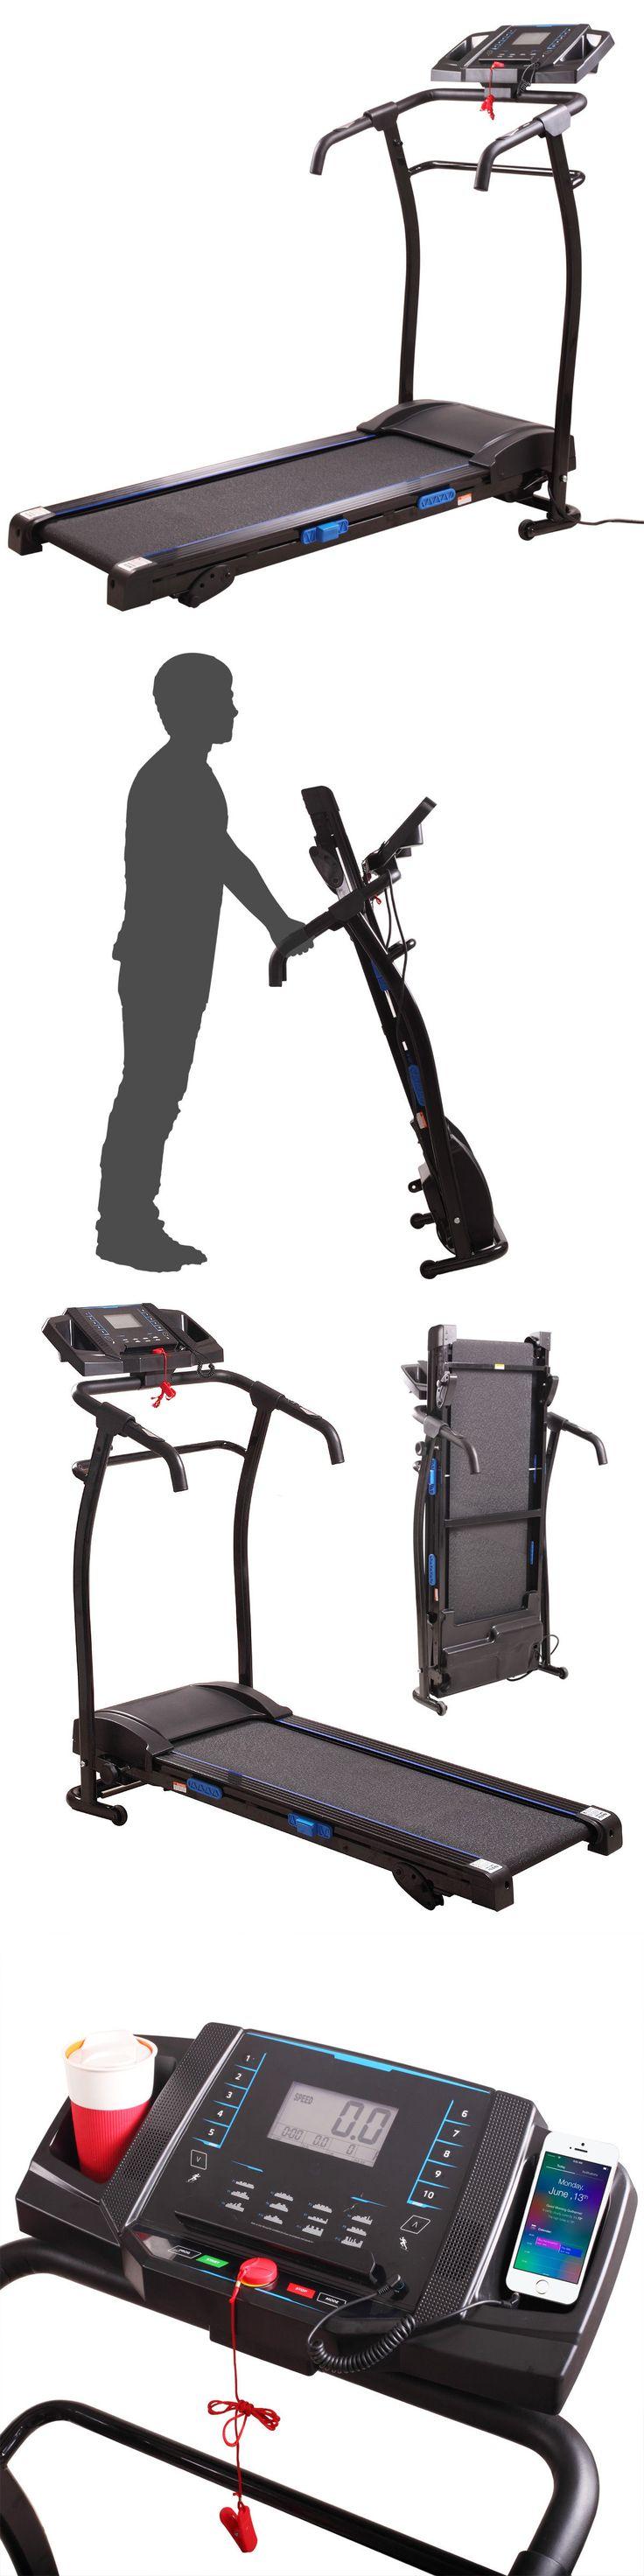 Treadmills 15280: Treadmill Portable 1500W Folding Electric Motorized Running Gym Fitness Machine -> BUY IT NOW ONLY: $294.99 on eBay!